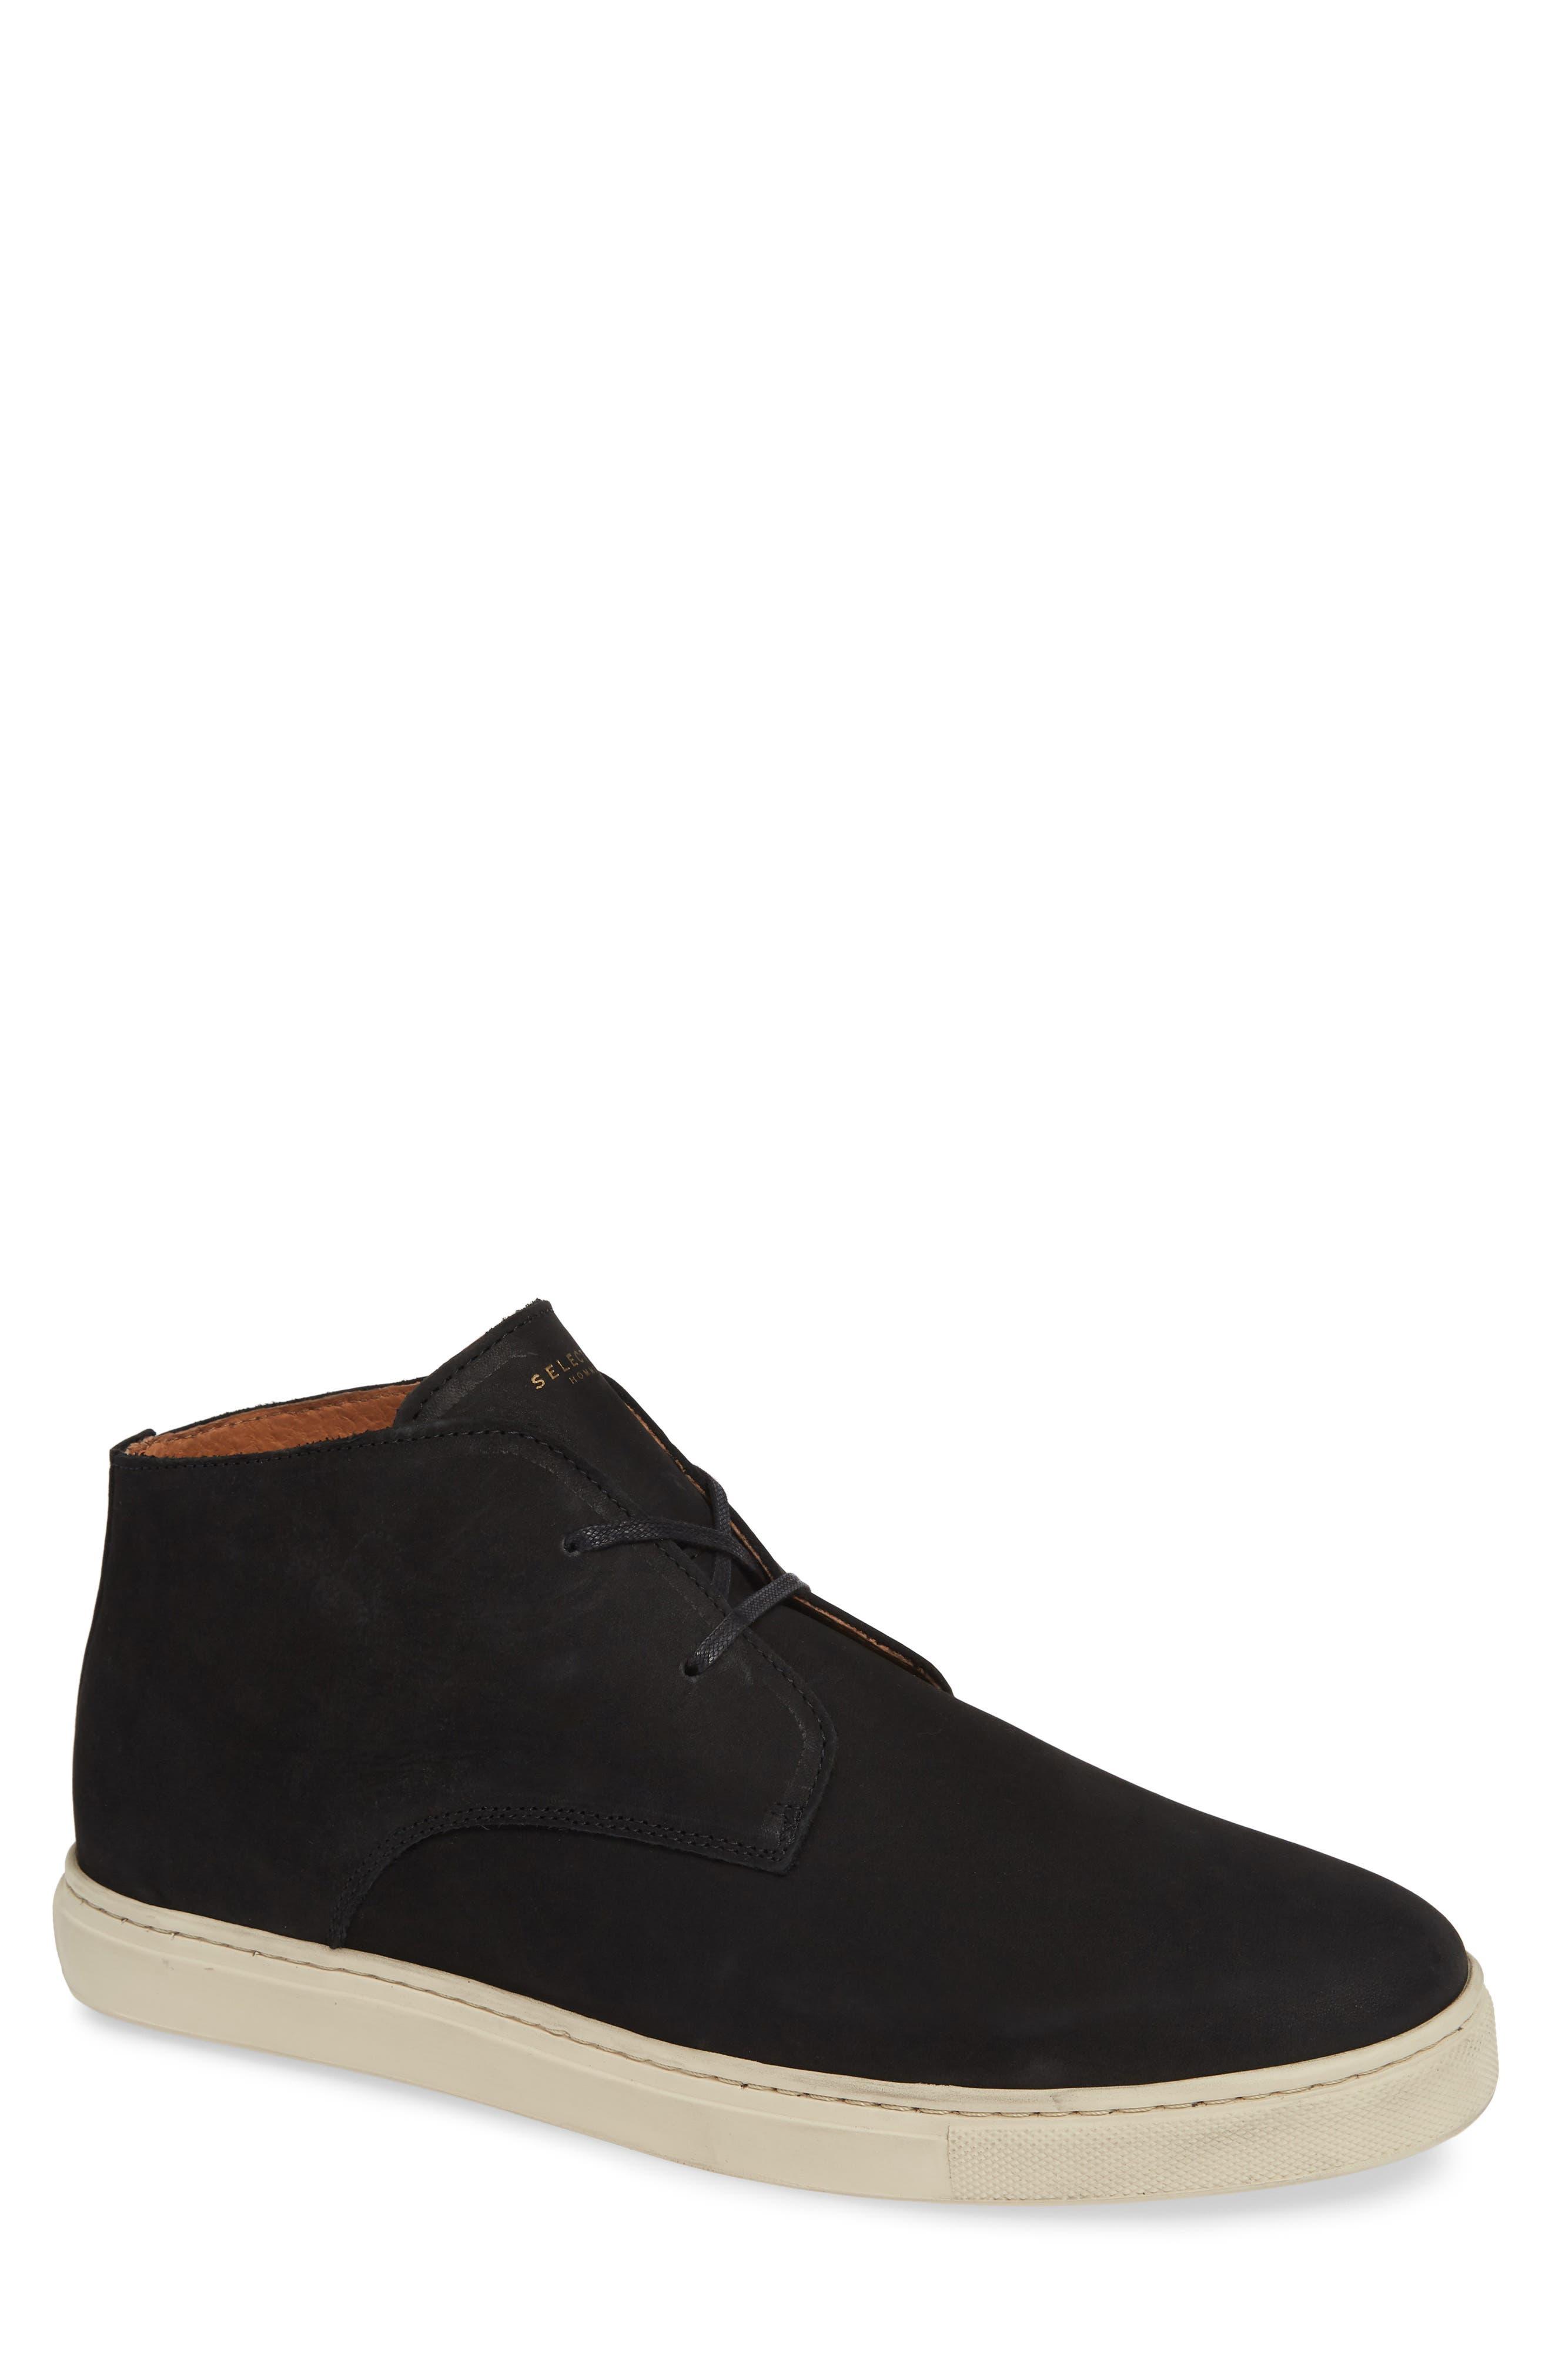 Dempsey Chukka Sneaker,                             Main thumbnail 1, color,                             BLACK